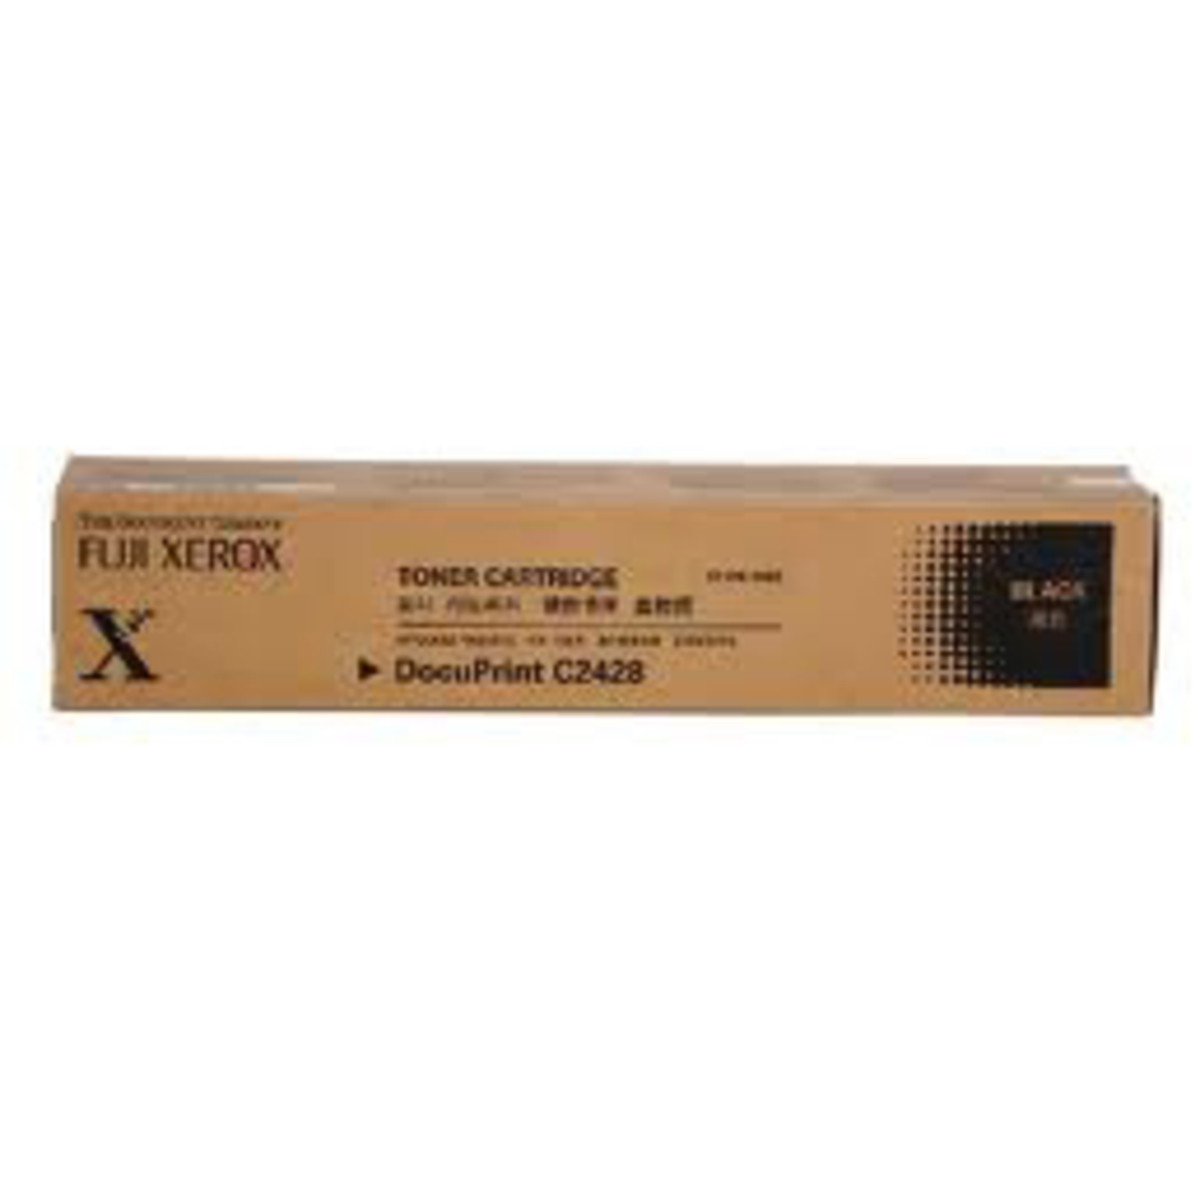 Xerox CT200379 Black Toner Cartridge - High Yield